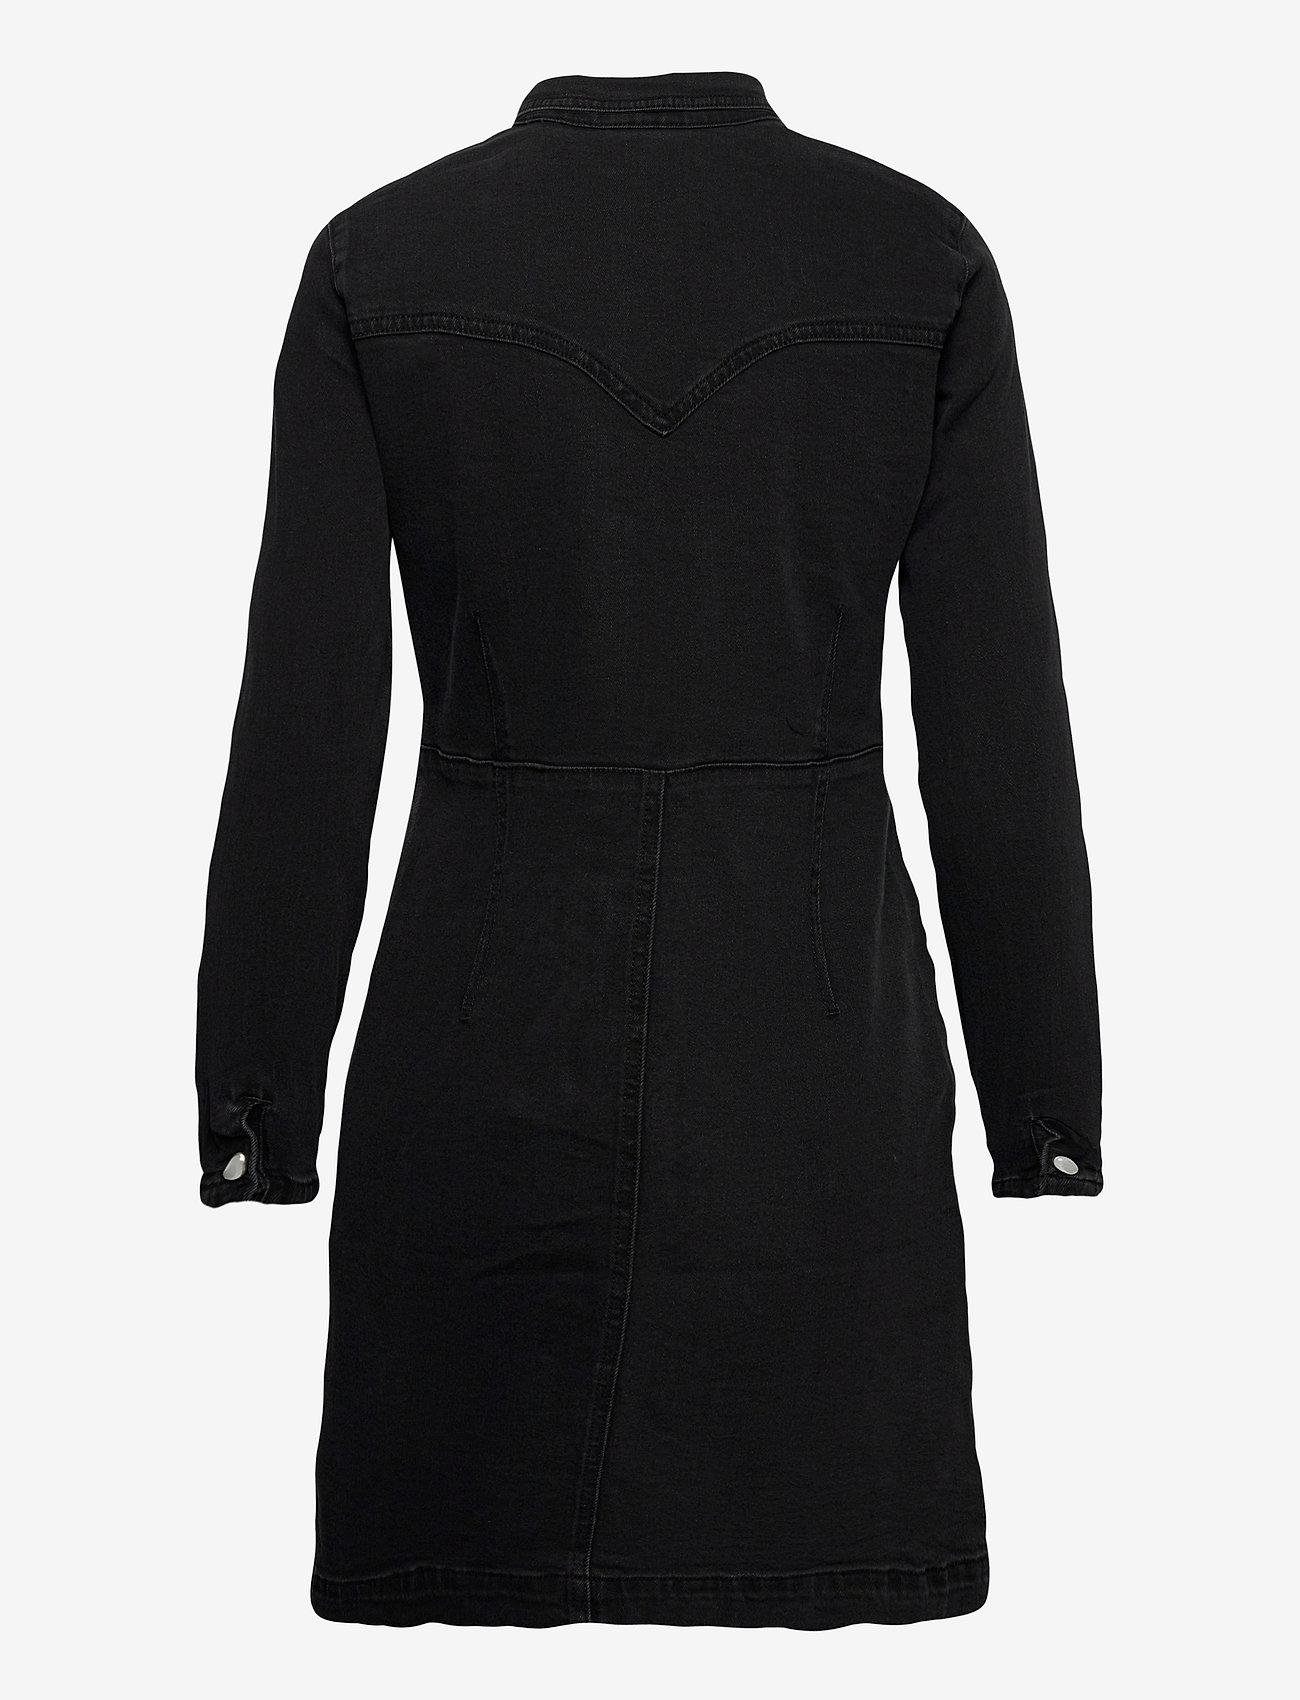 Iholina Dr (Washed Black) (60 €) - ICHI andRI